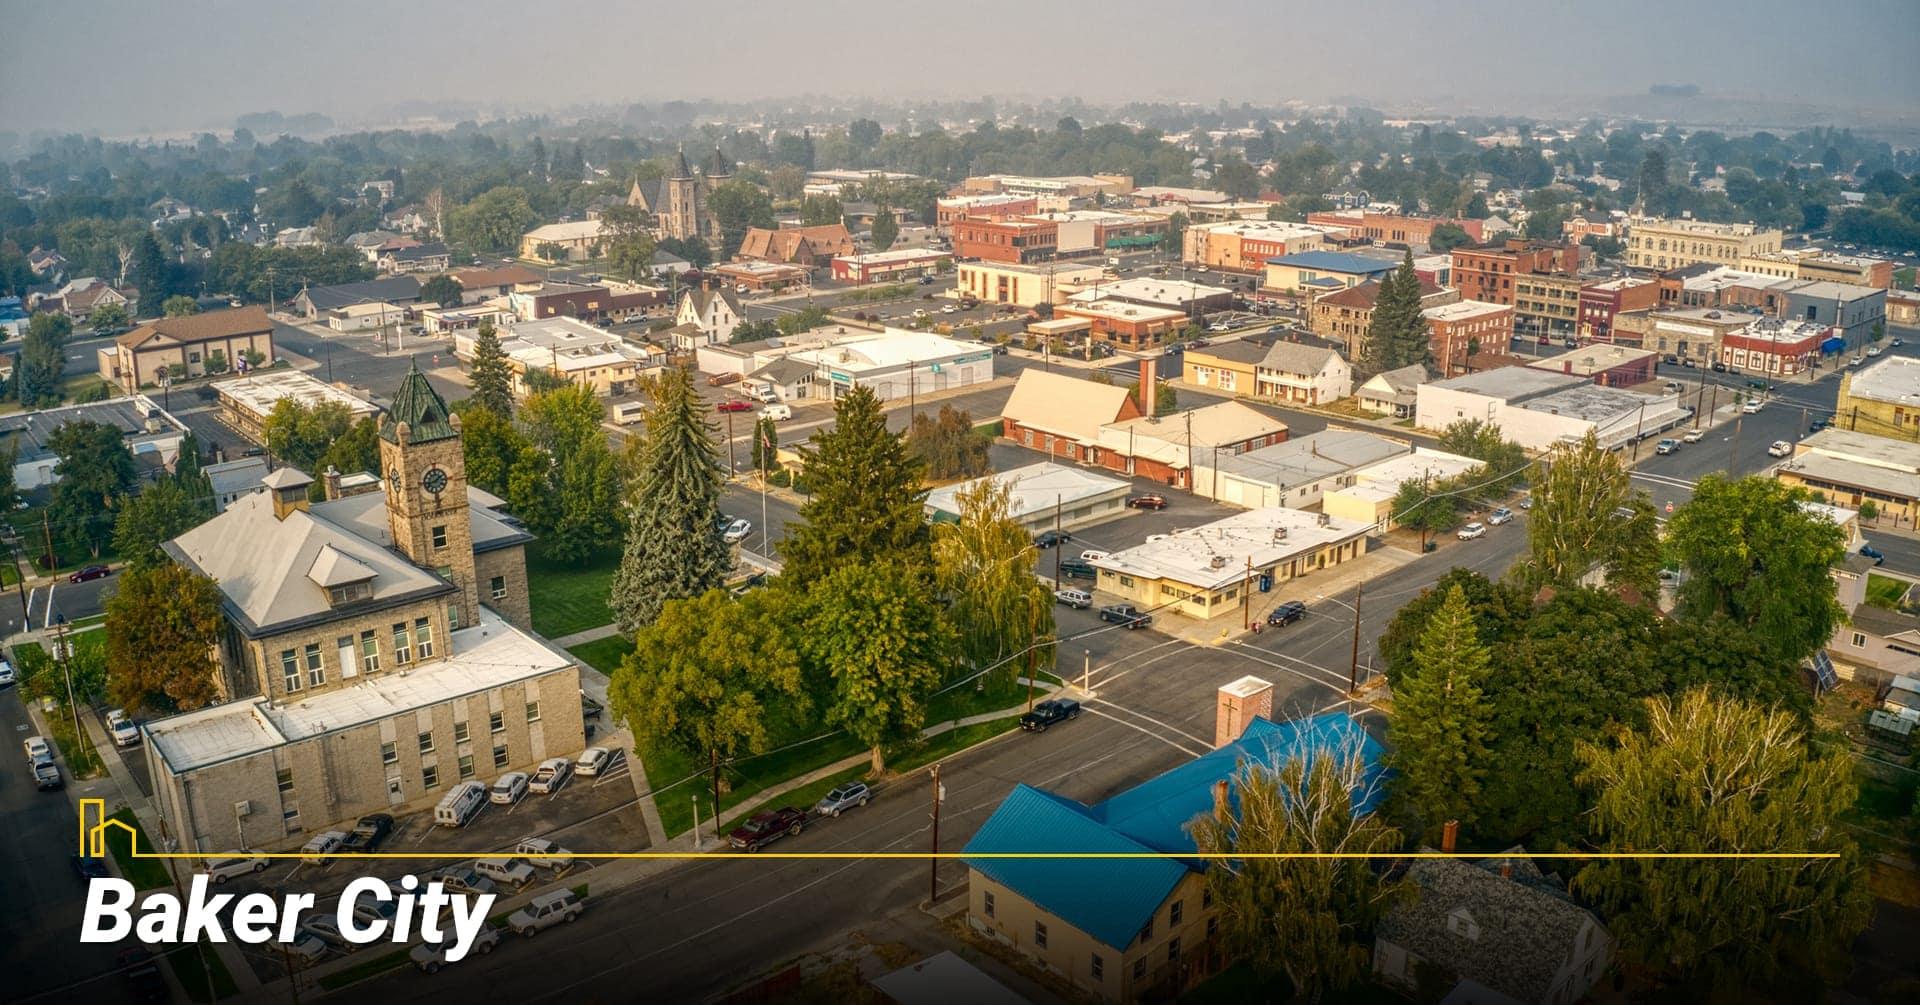 Baker City city in Oregon